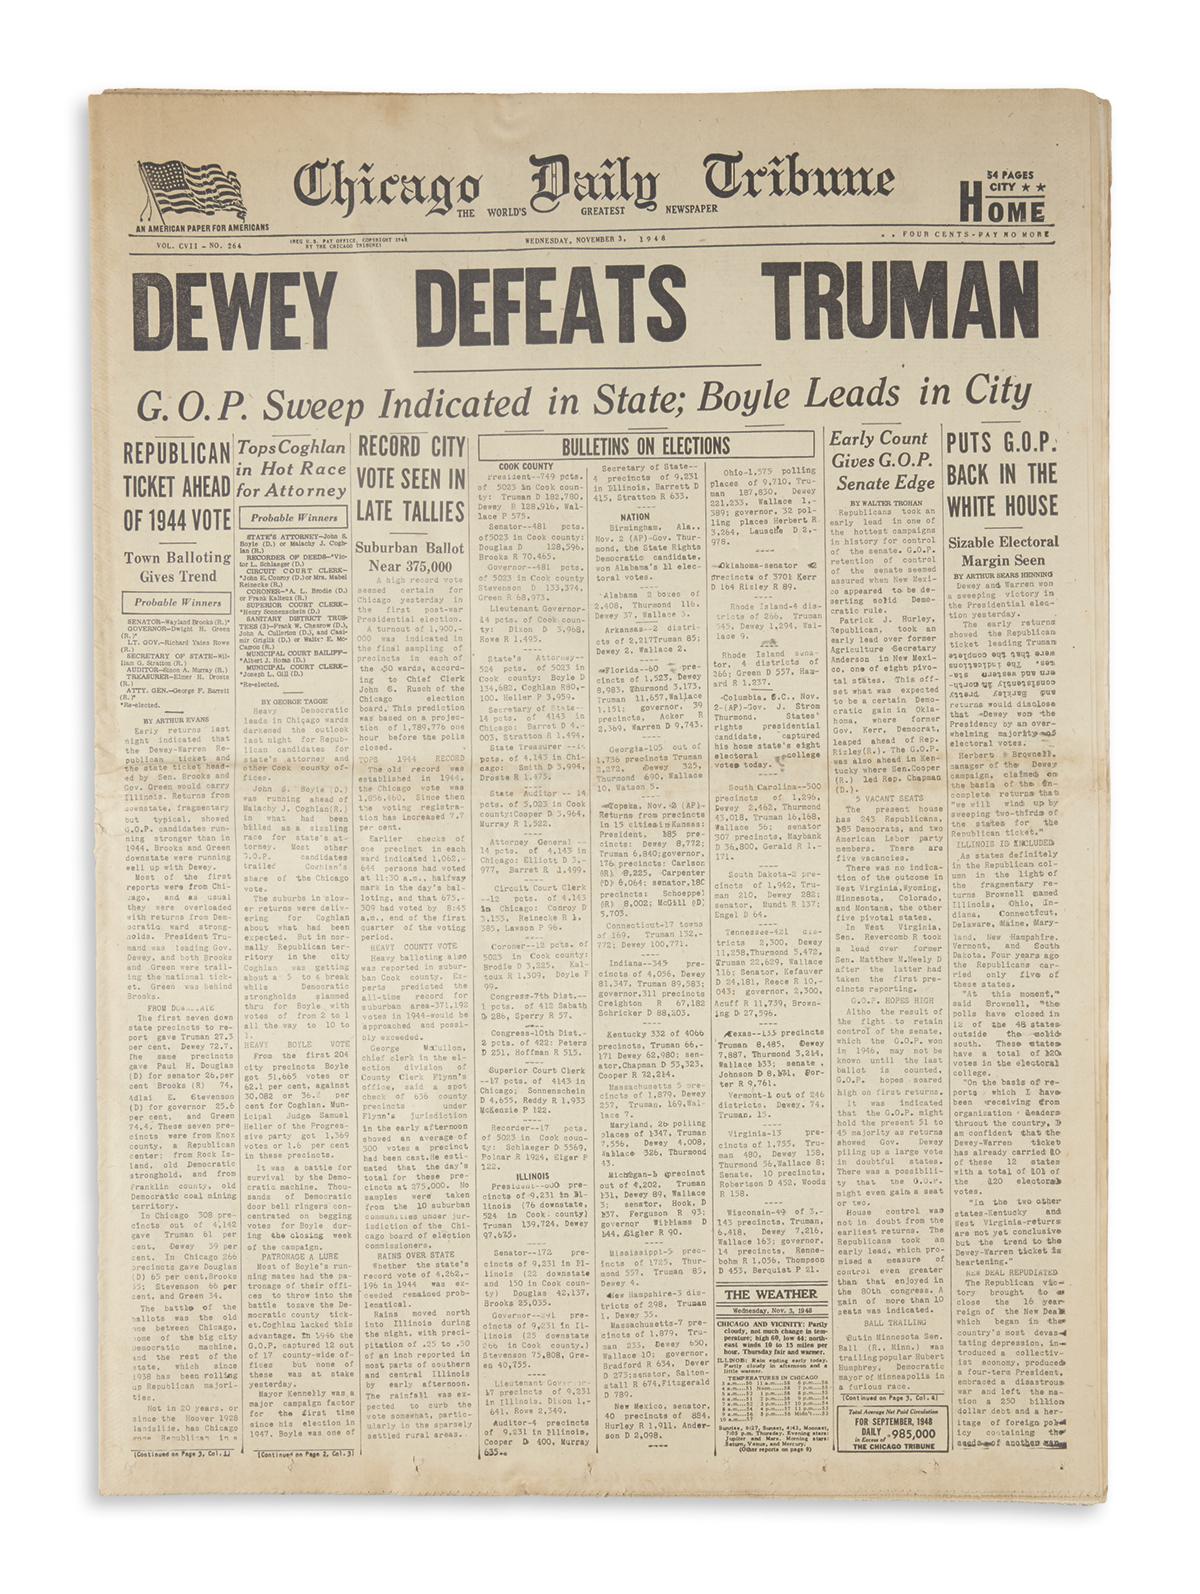 (TRUMAN, HARRY S.) Chicago Daily Tribune.